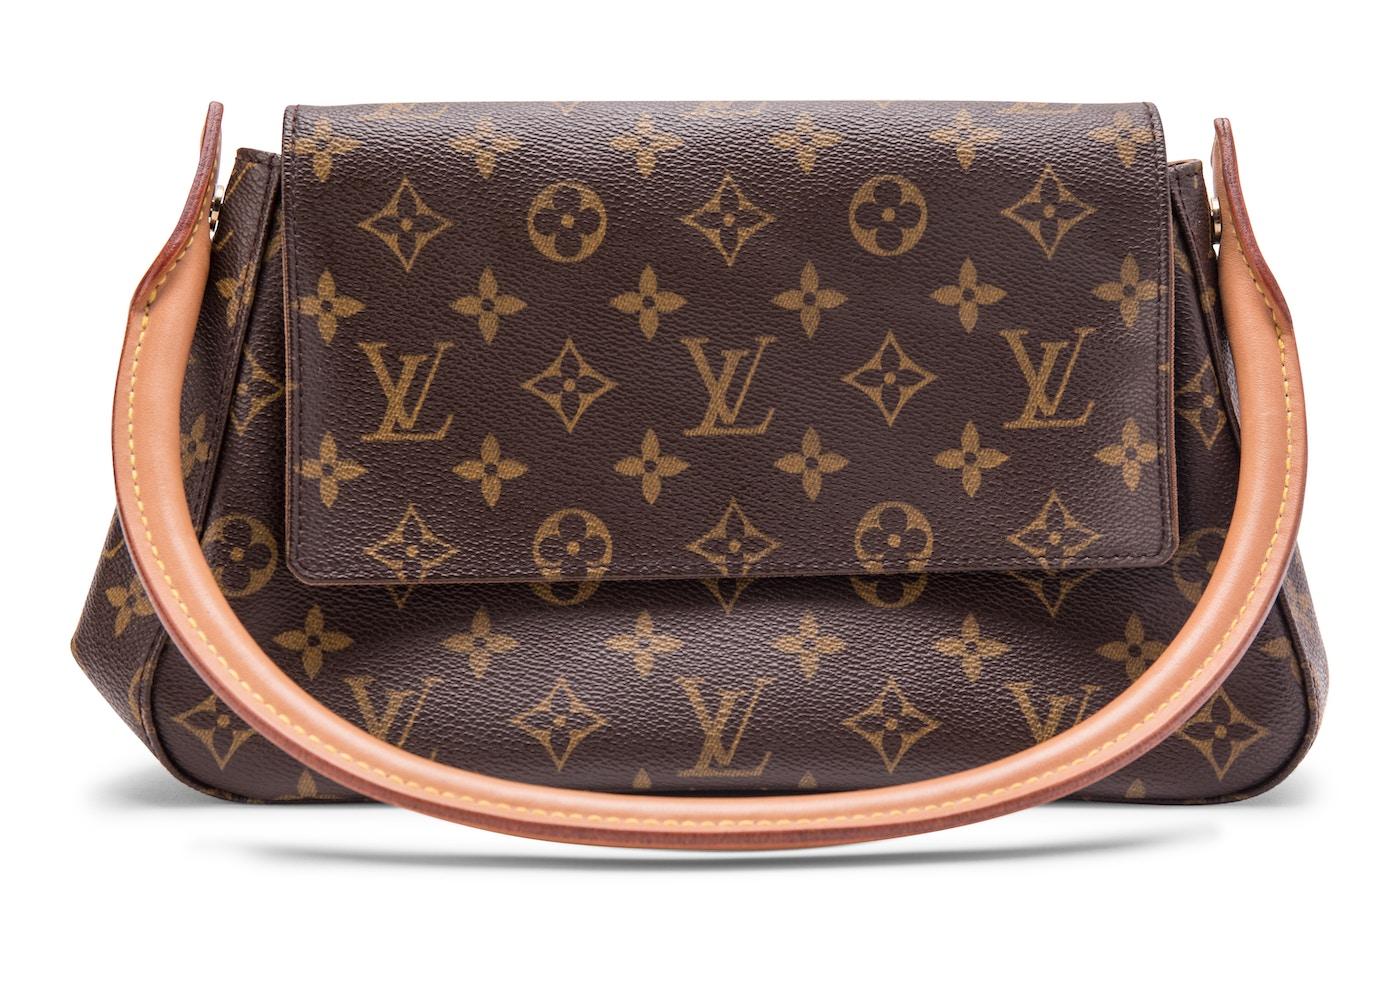 524052ce8a12 Louis Vuitton Looping Monogram Mini Brown. Monogram Mini Brown